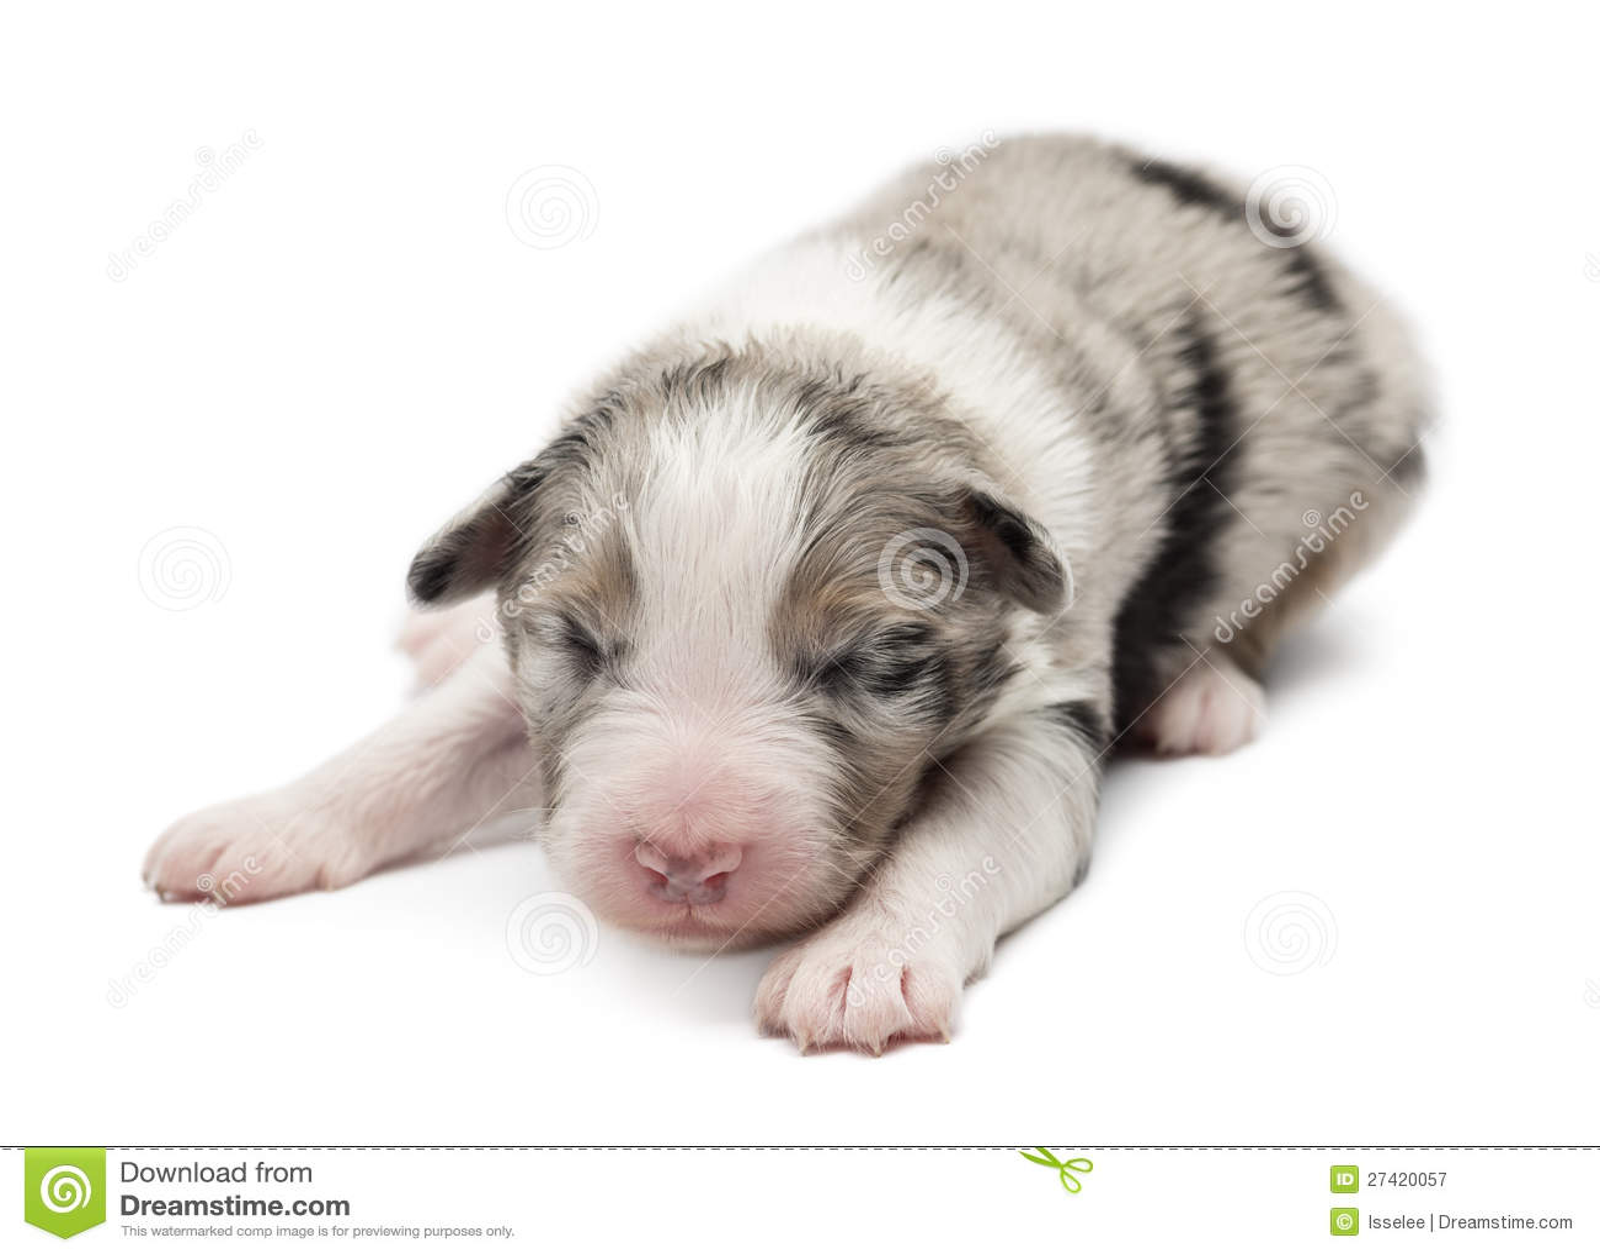 Royalty Free Stock Photography: Australian Shepherd puppy, 7 days old ...